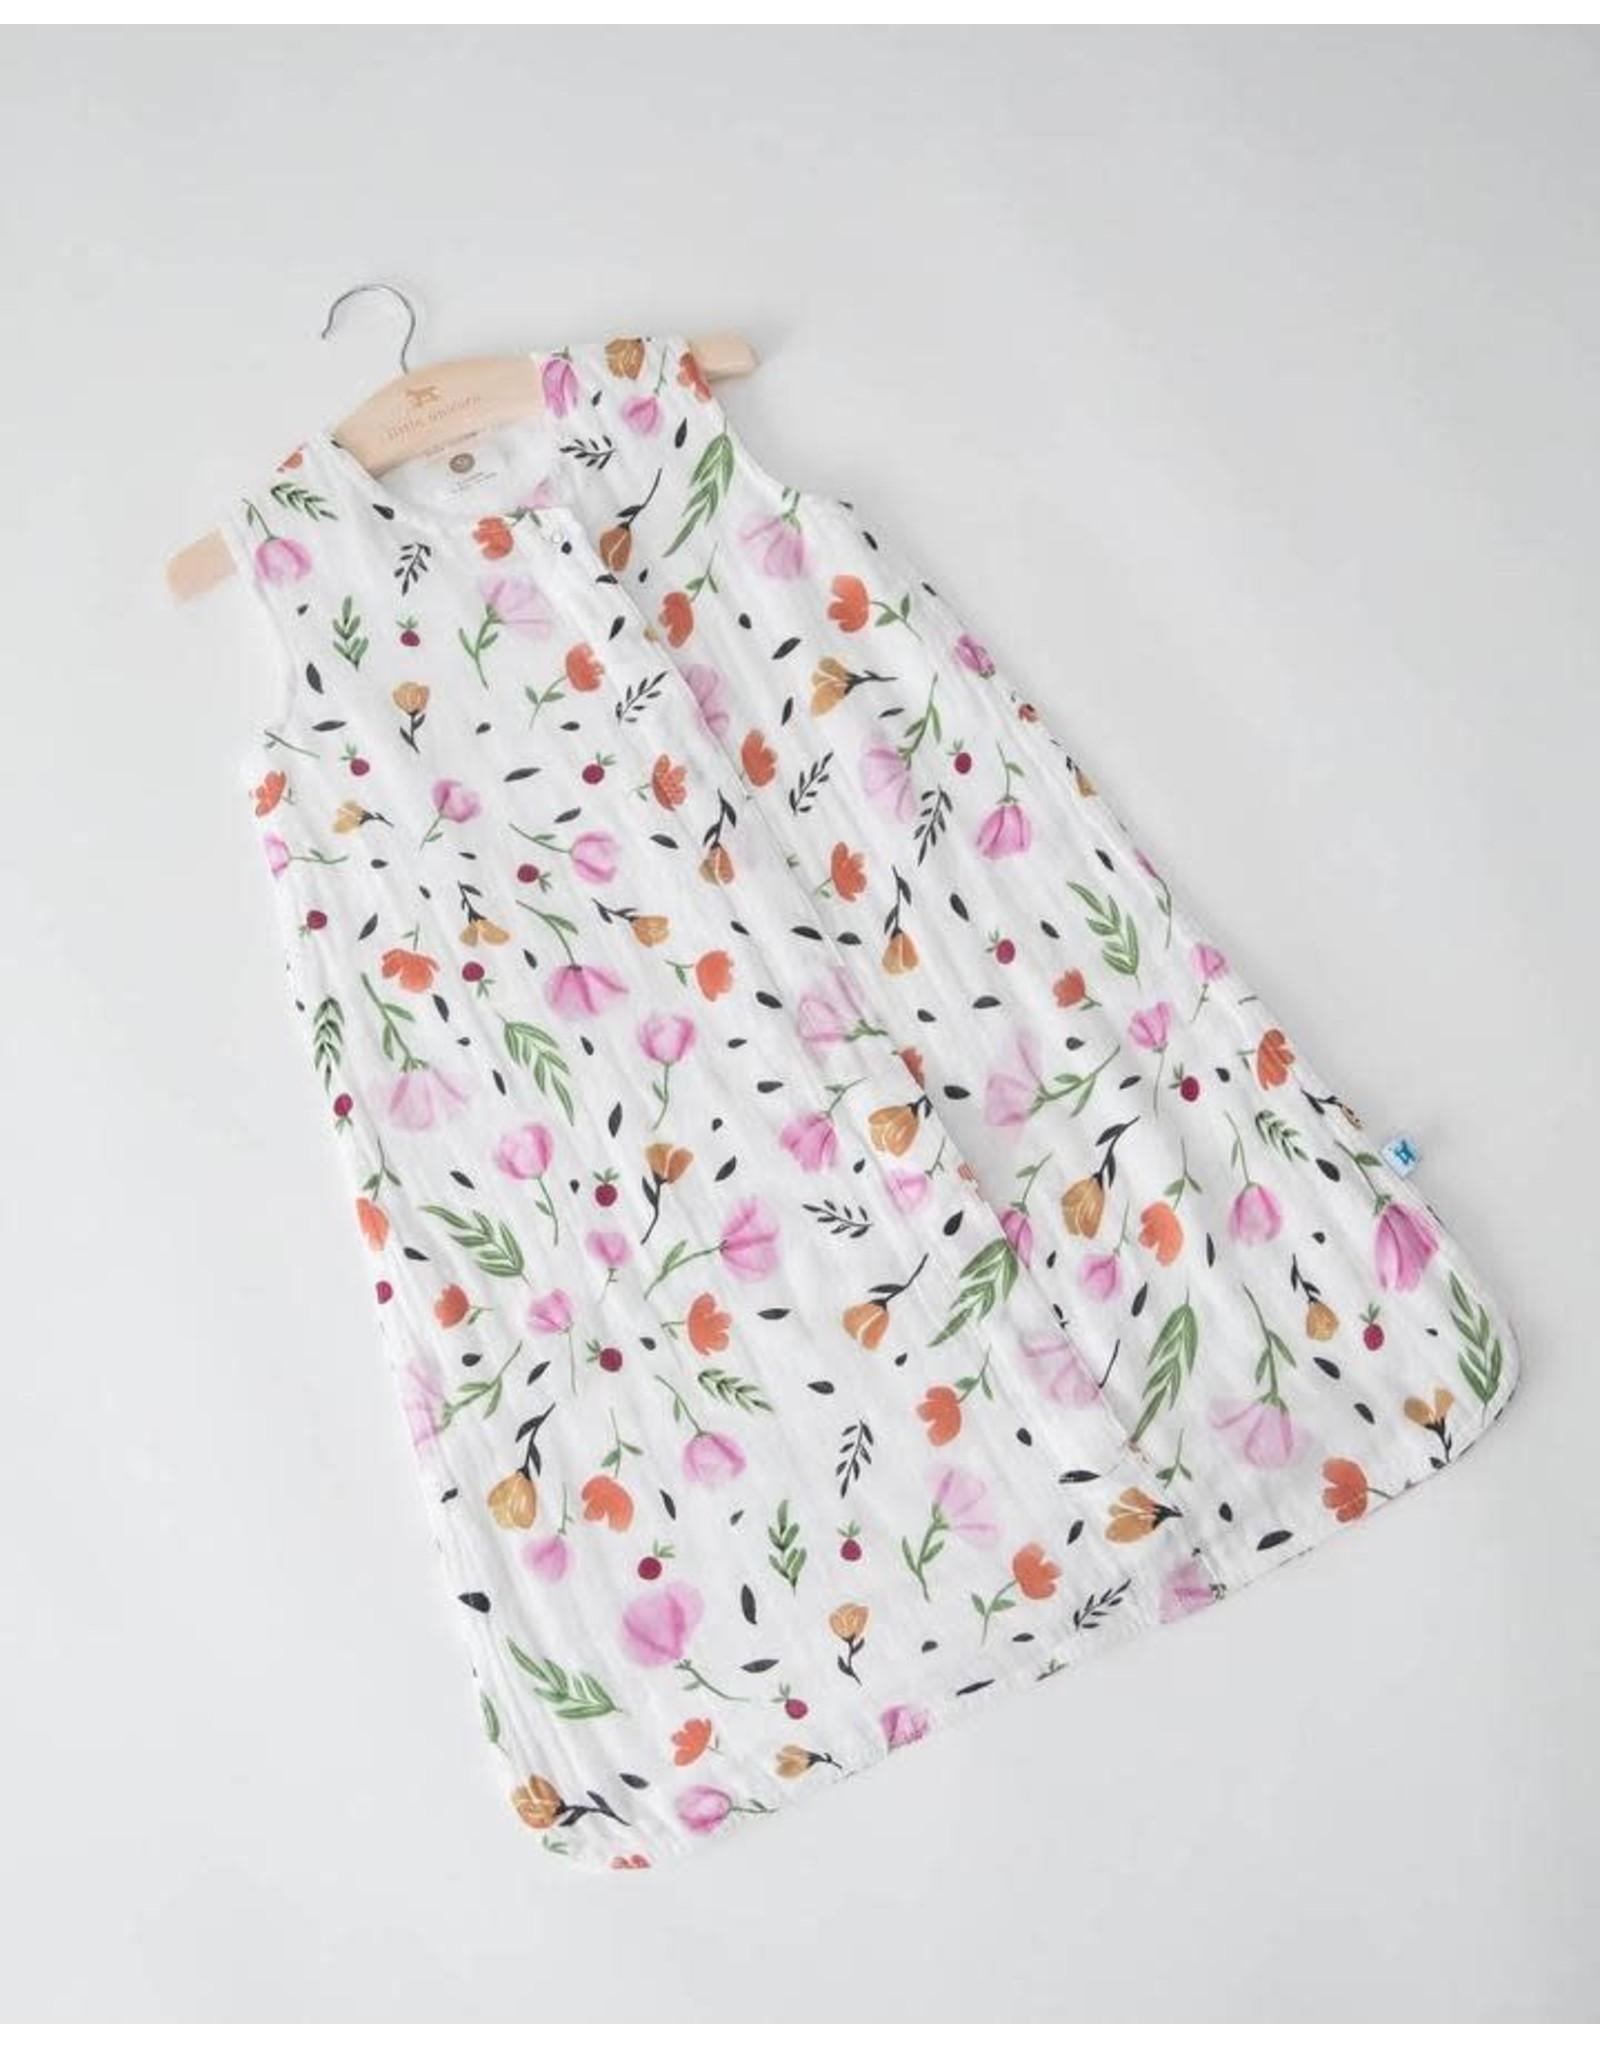 Sleeping Bag Berry & Bloom MW REG SOLD